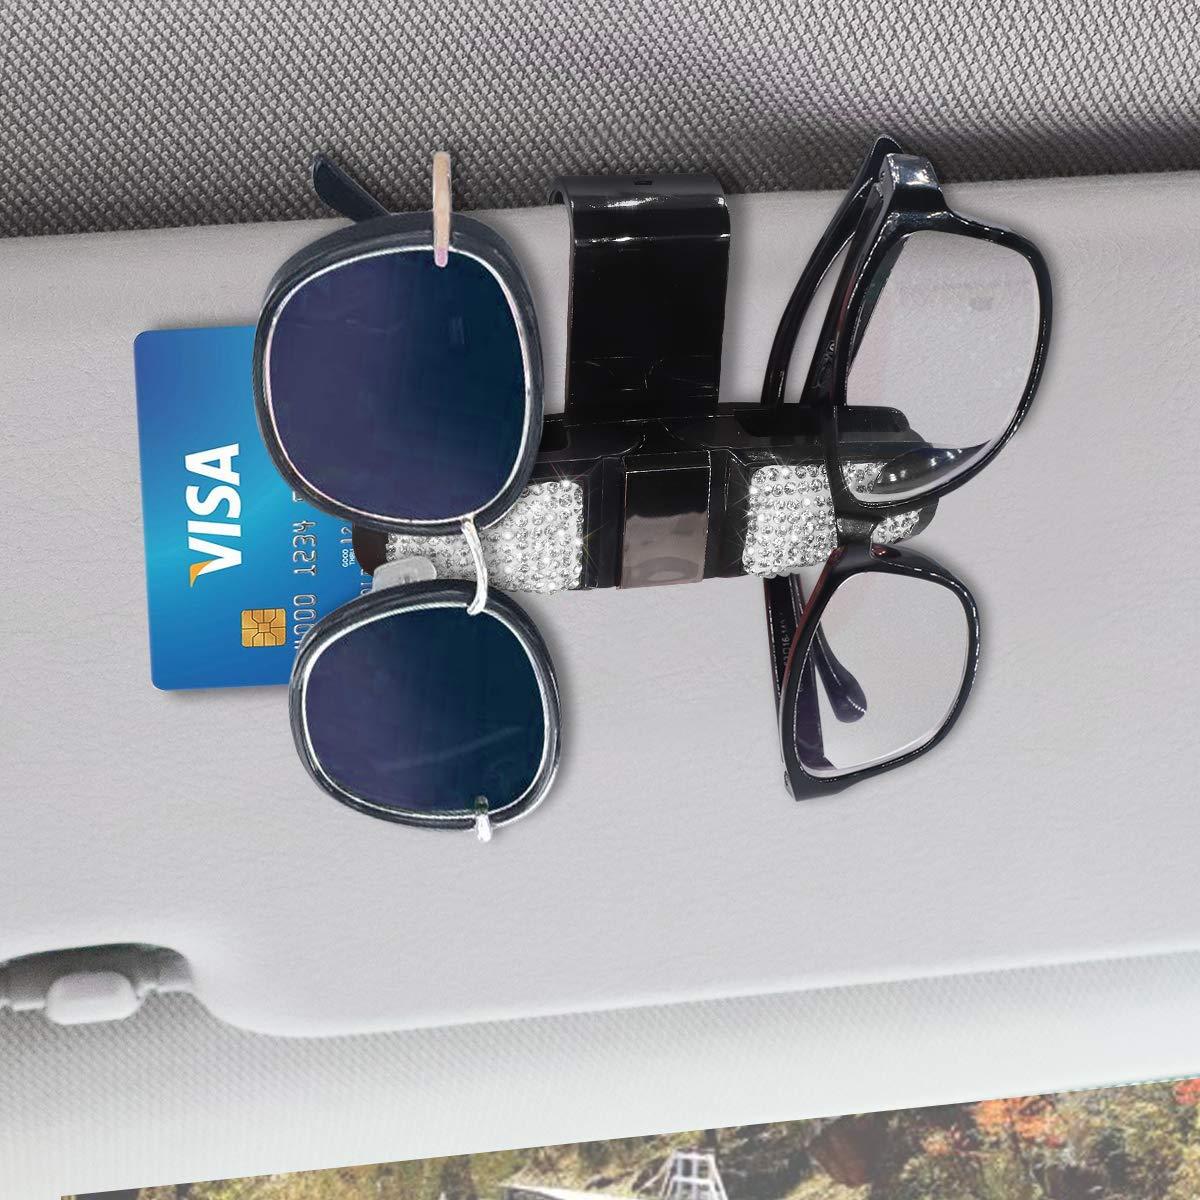 Glasses Holder for Car Visor,Fashion Bling Crystal Rhinestones Car Sun Visor Glasses with Double-Ended Ticket Clip Holder Accessories Pink